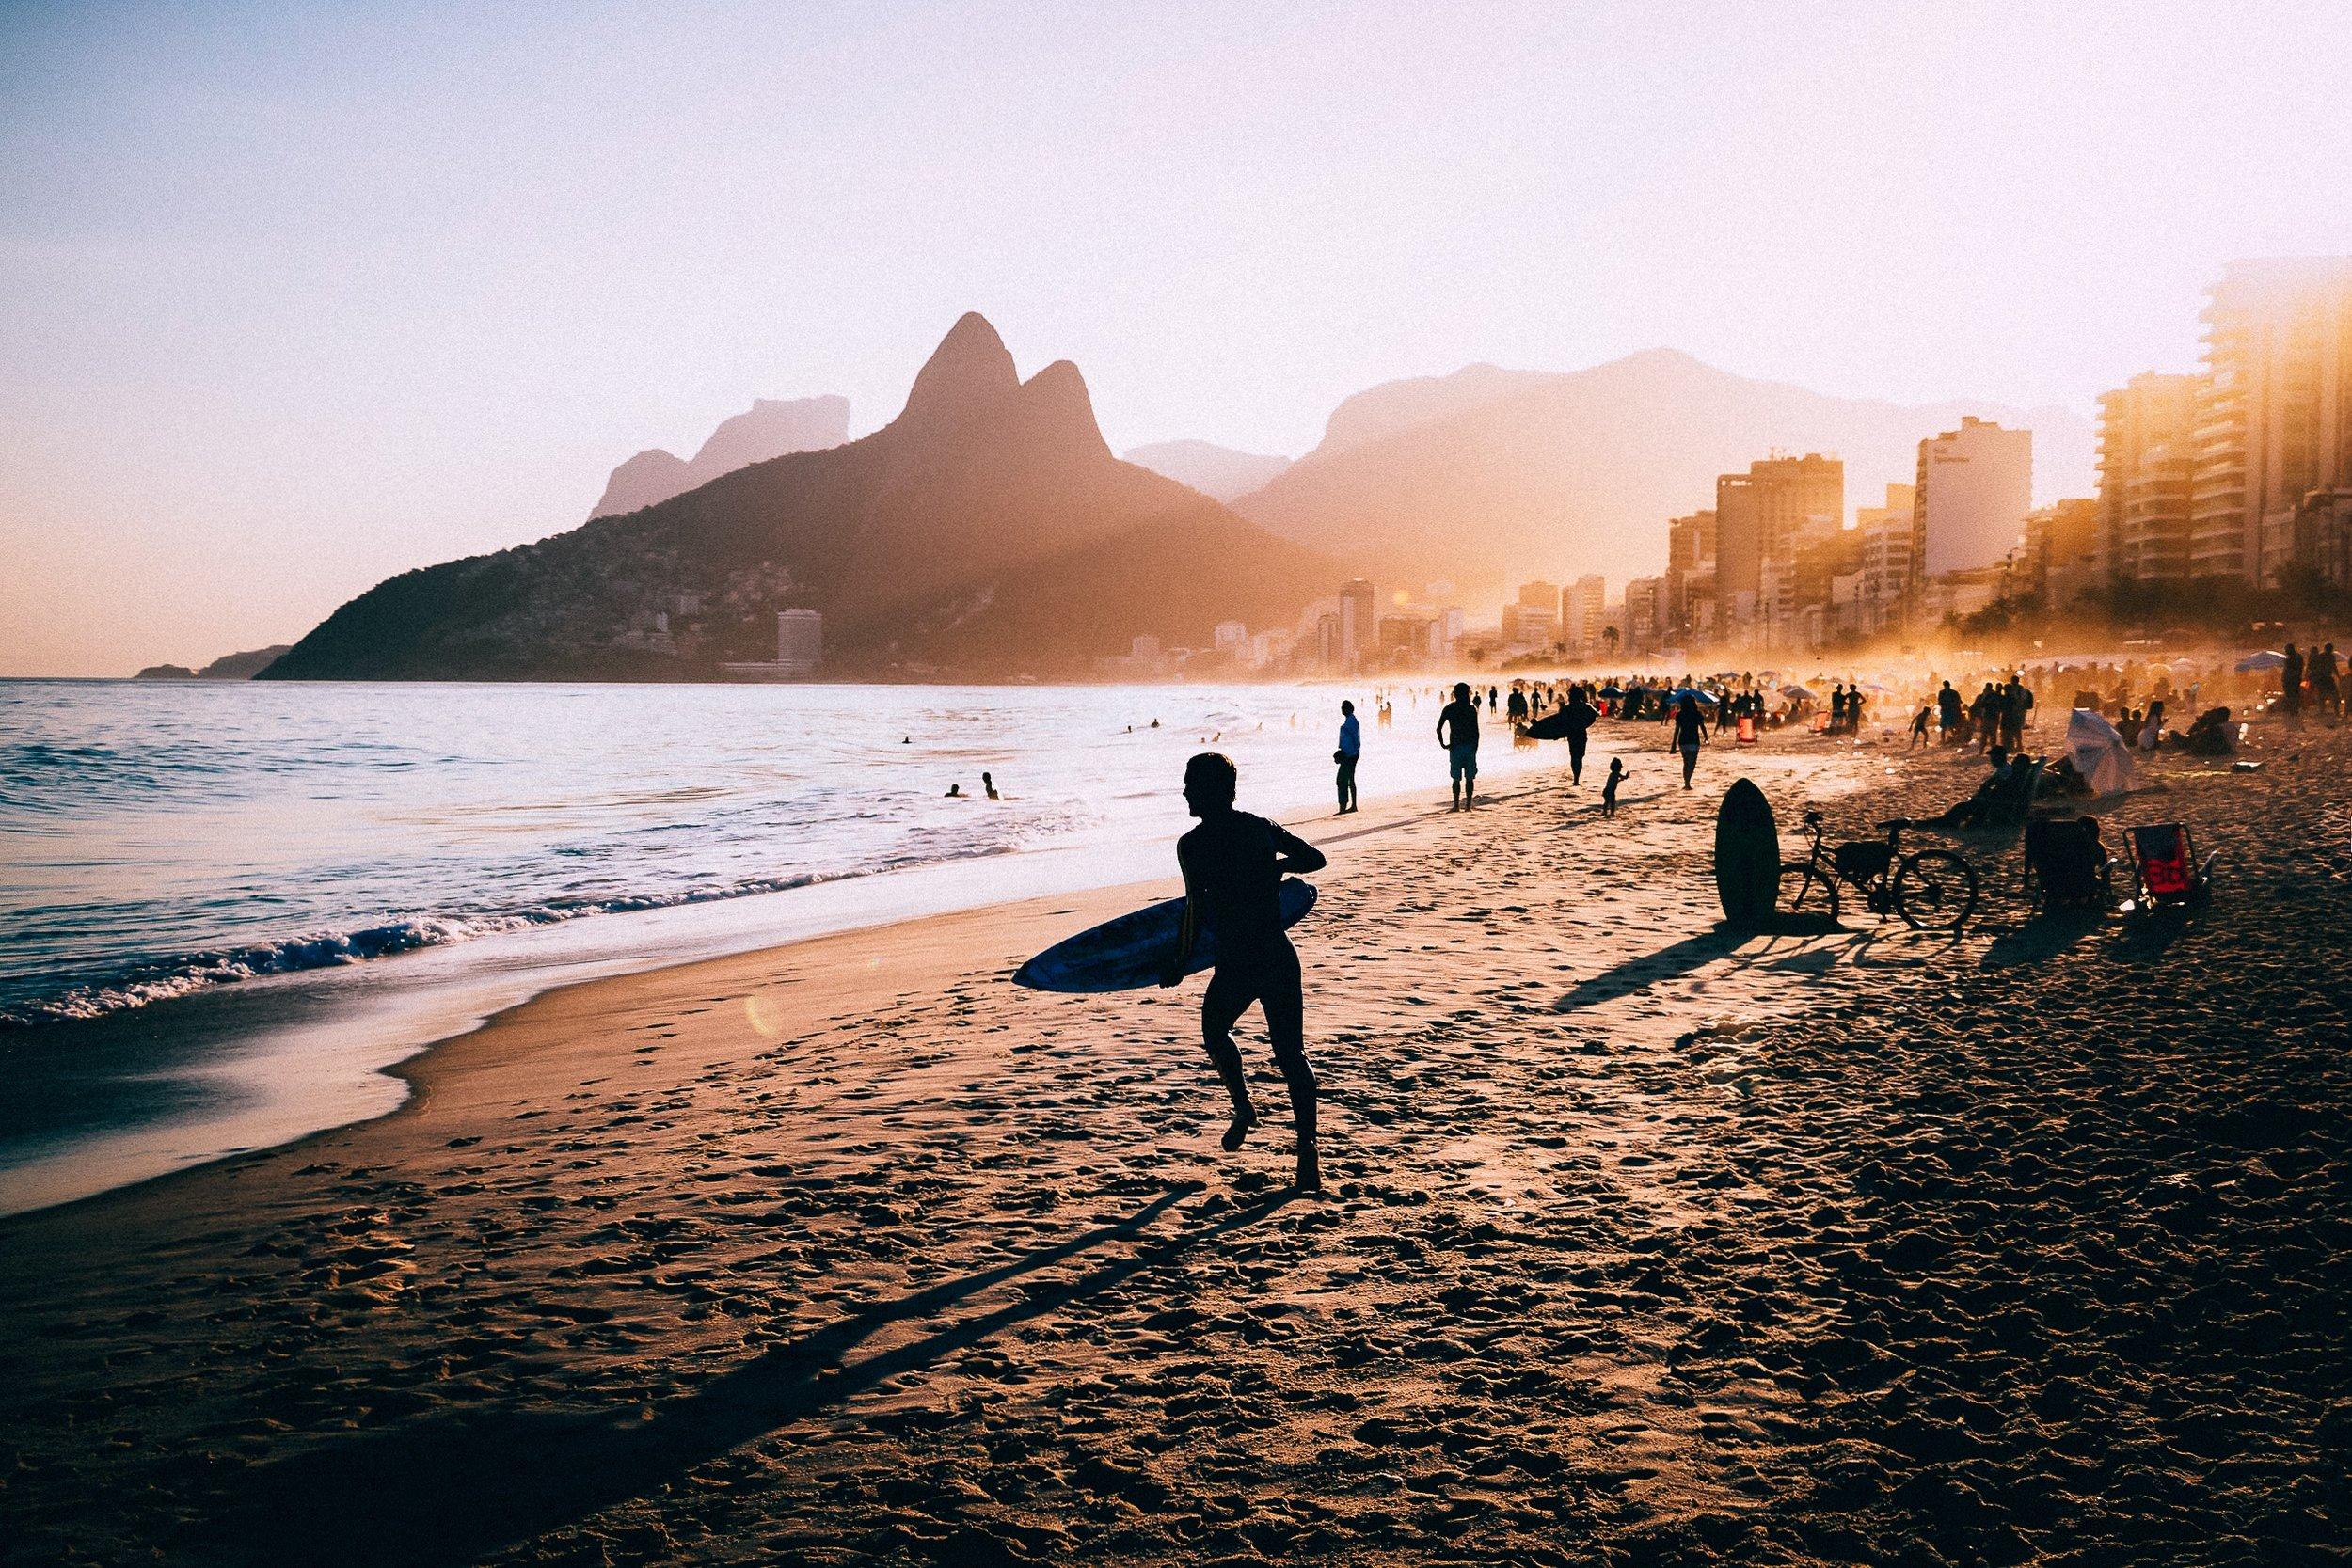 Surfers at Sunset on Copacabana Beach, Rio